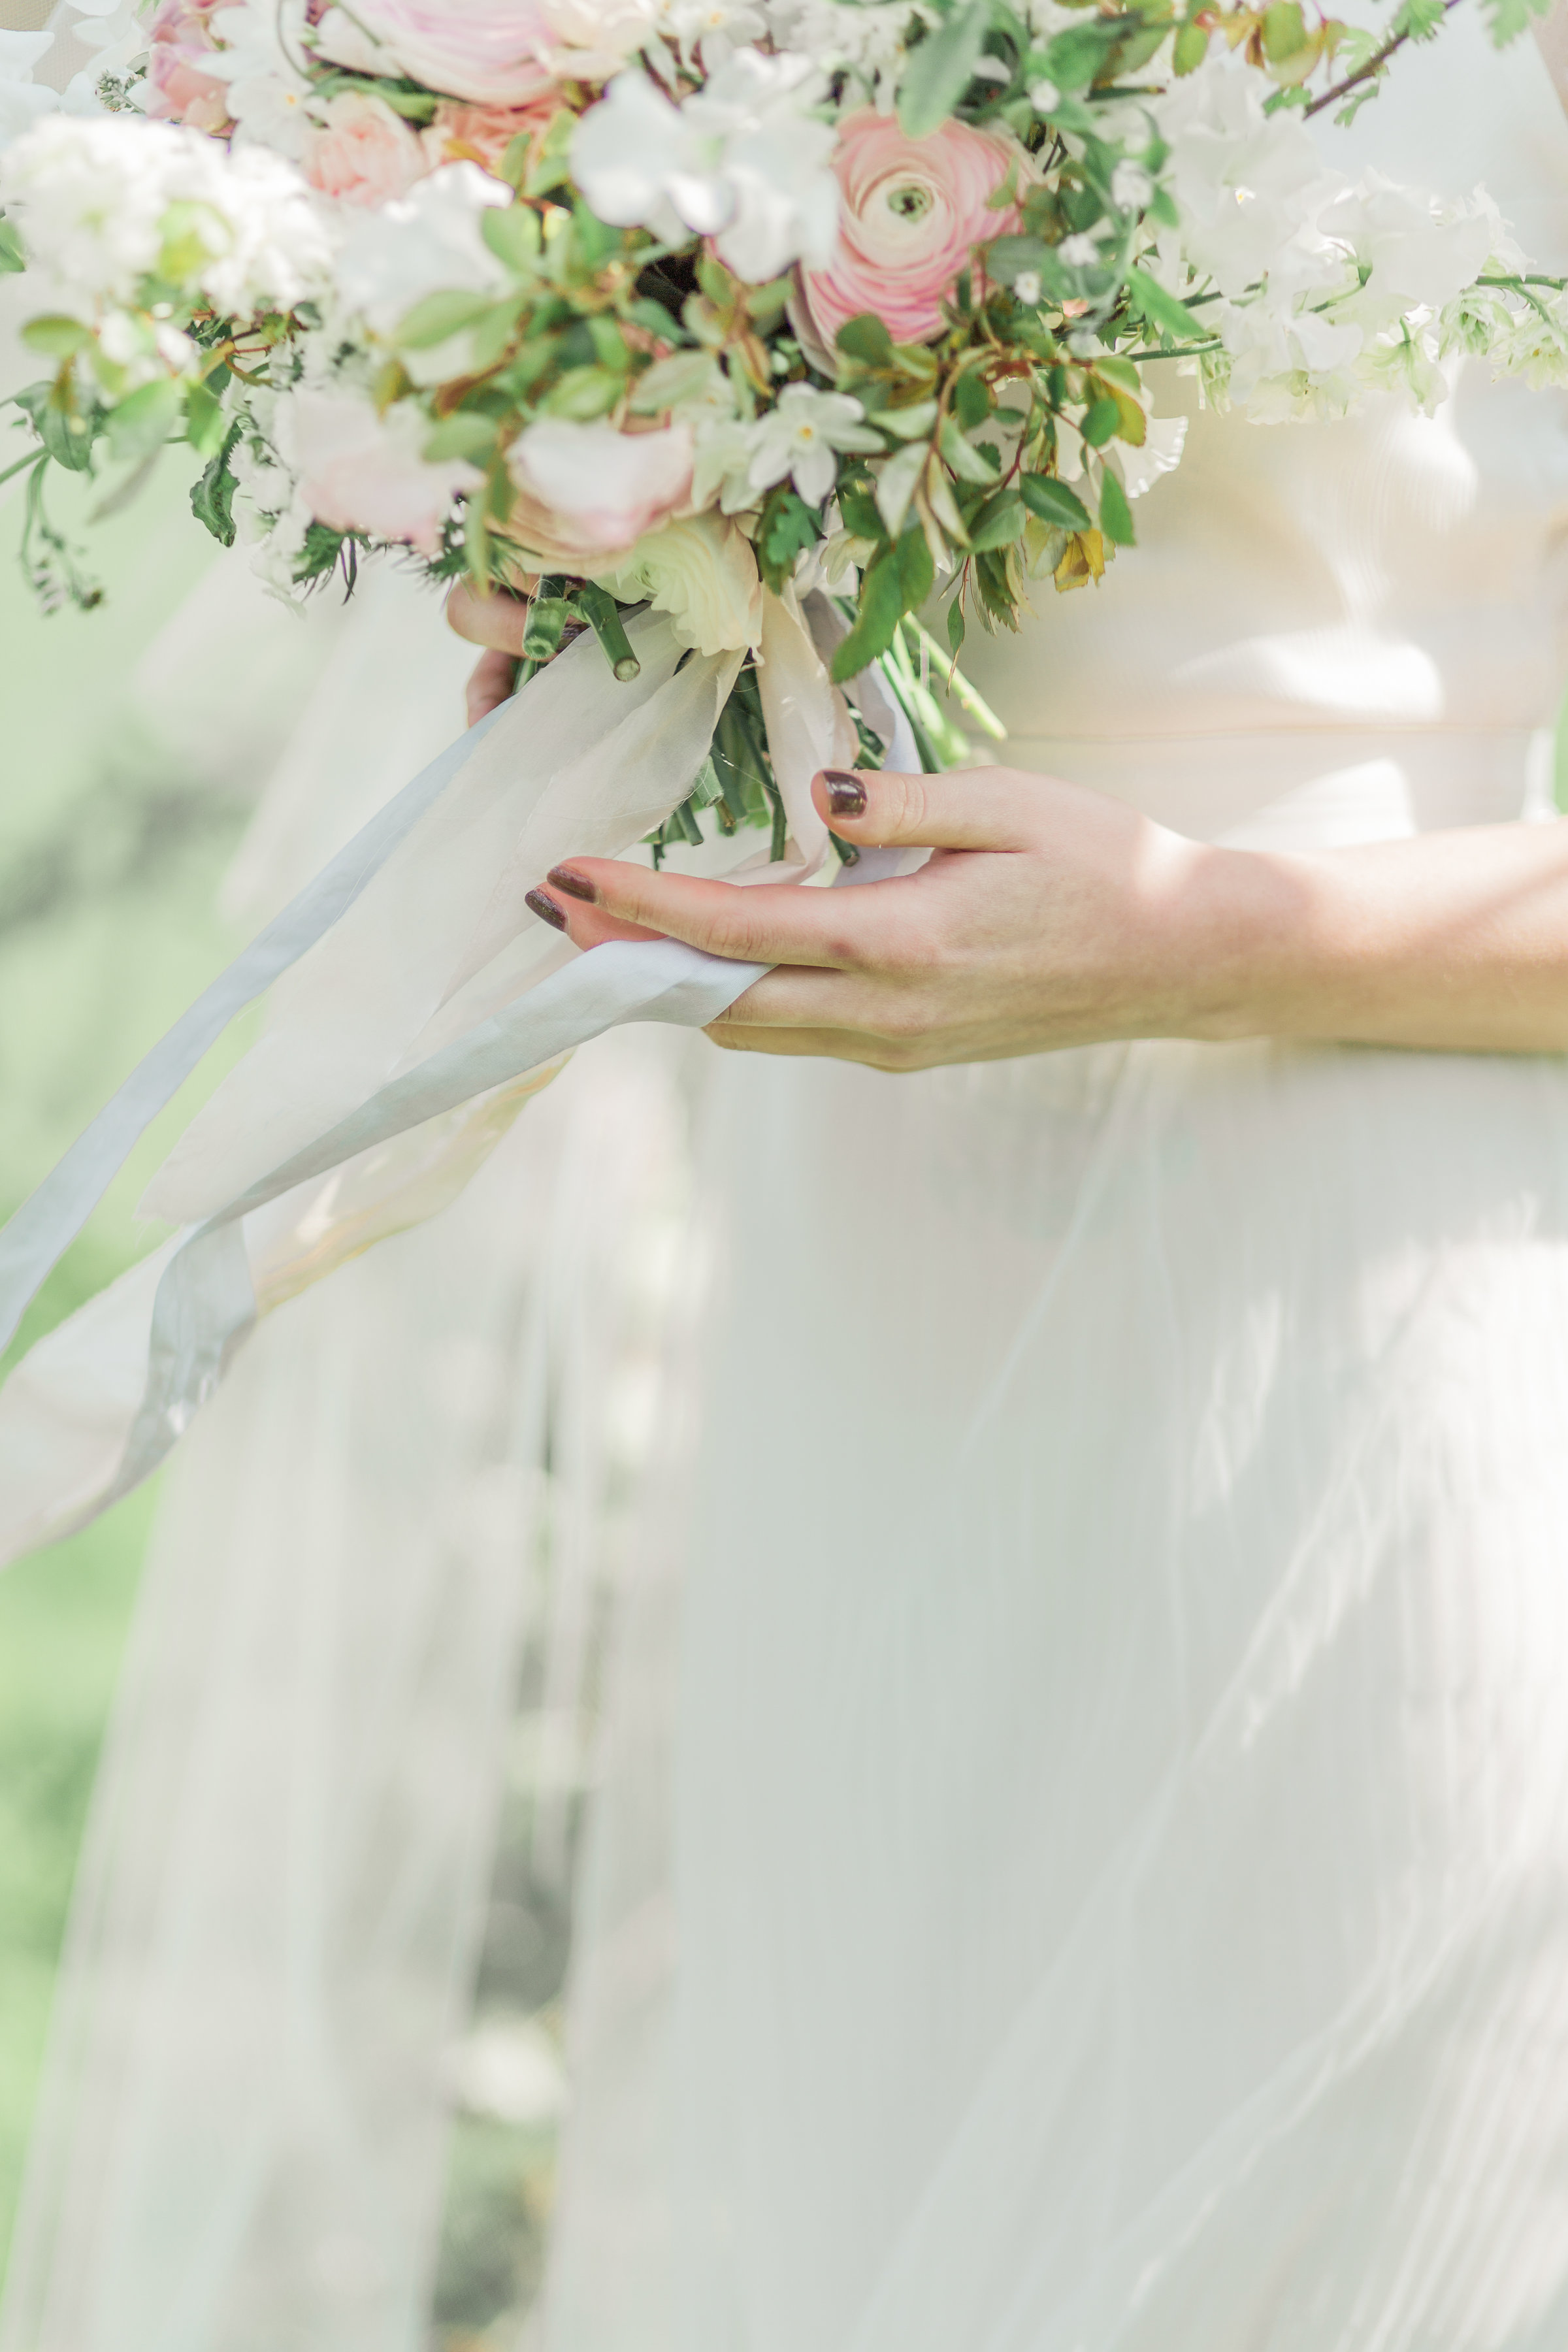 Chafford Park wedding venue Jennifer pinder floristry school in kent